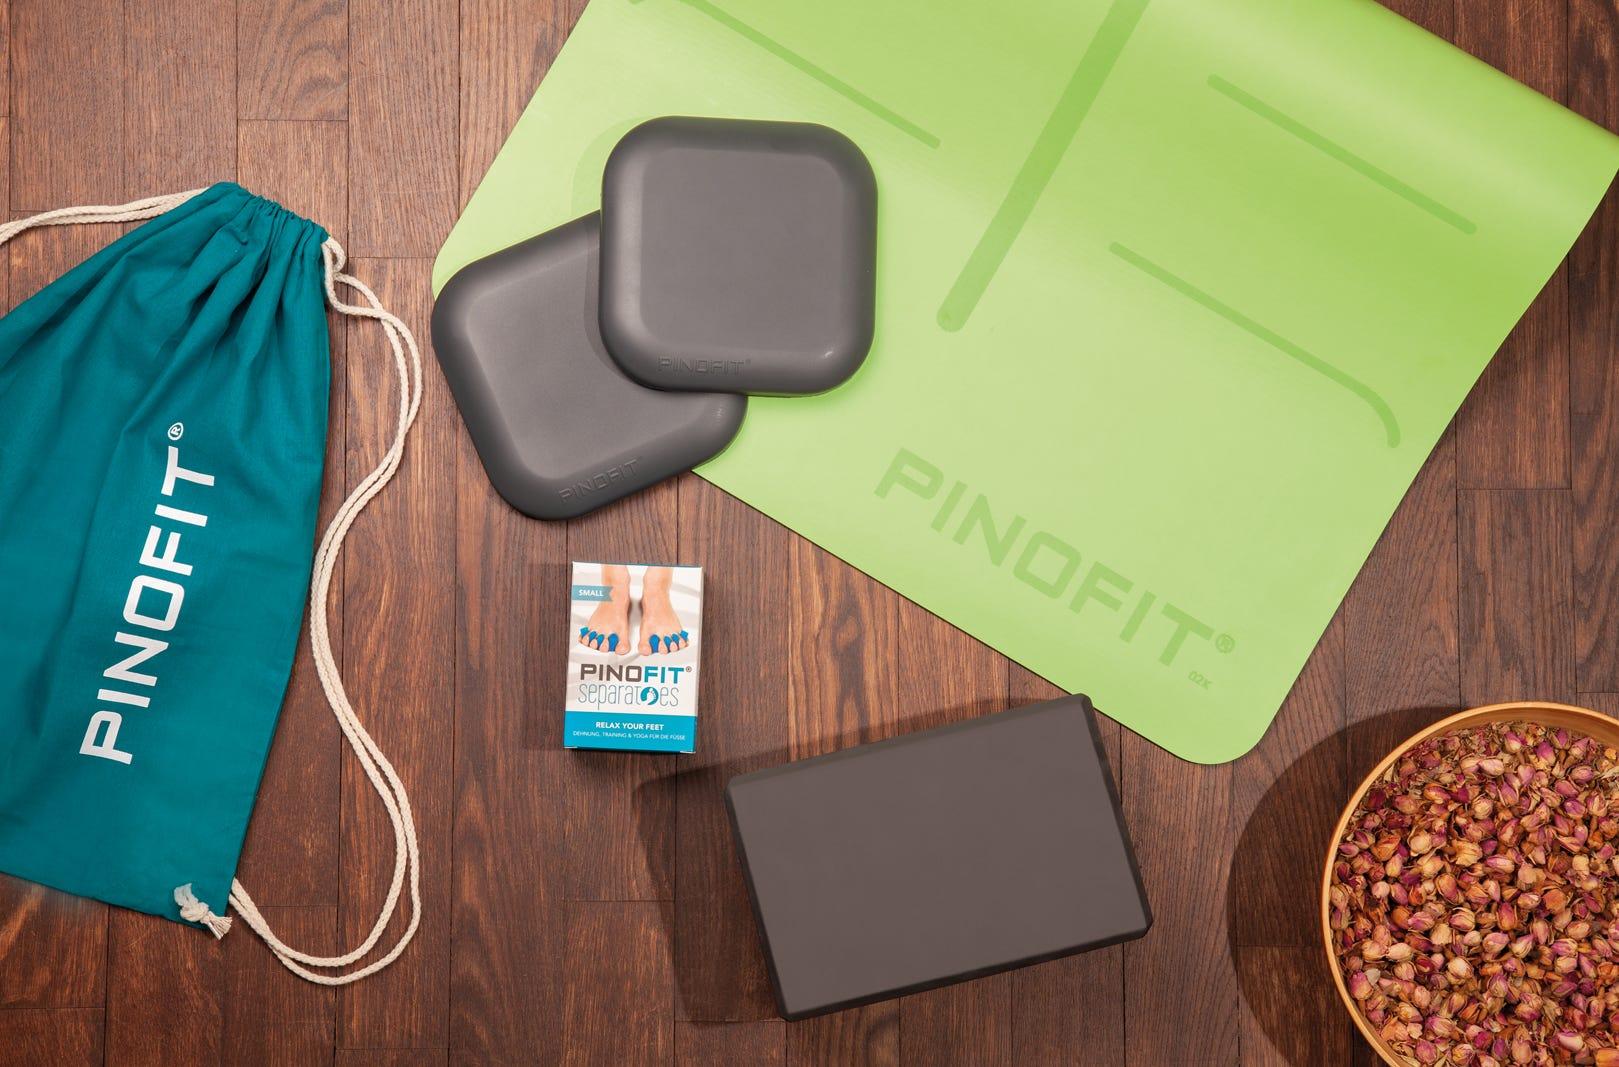 PINOFIT Set - Stay@home & do yoga